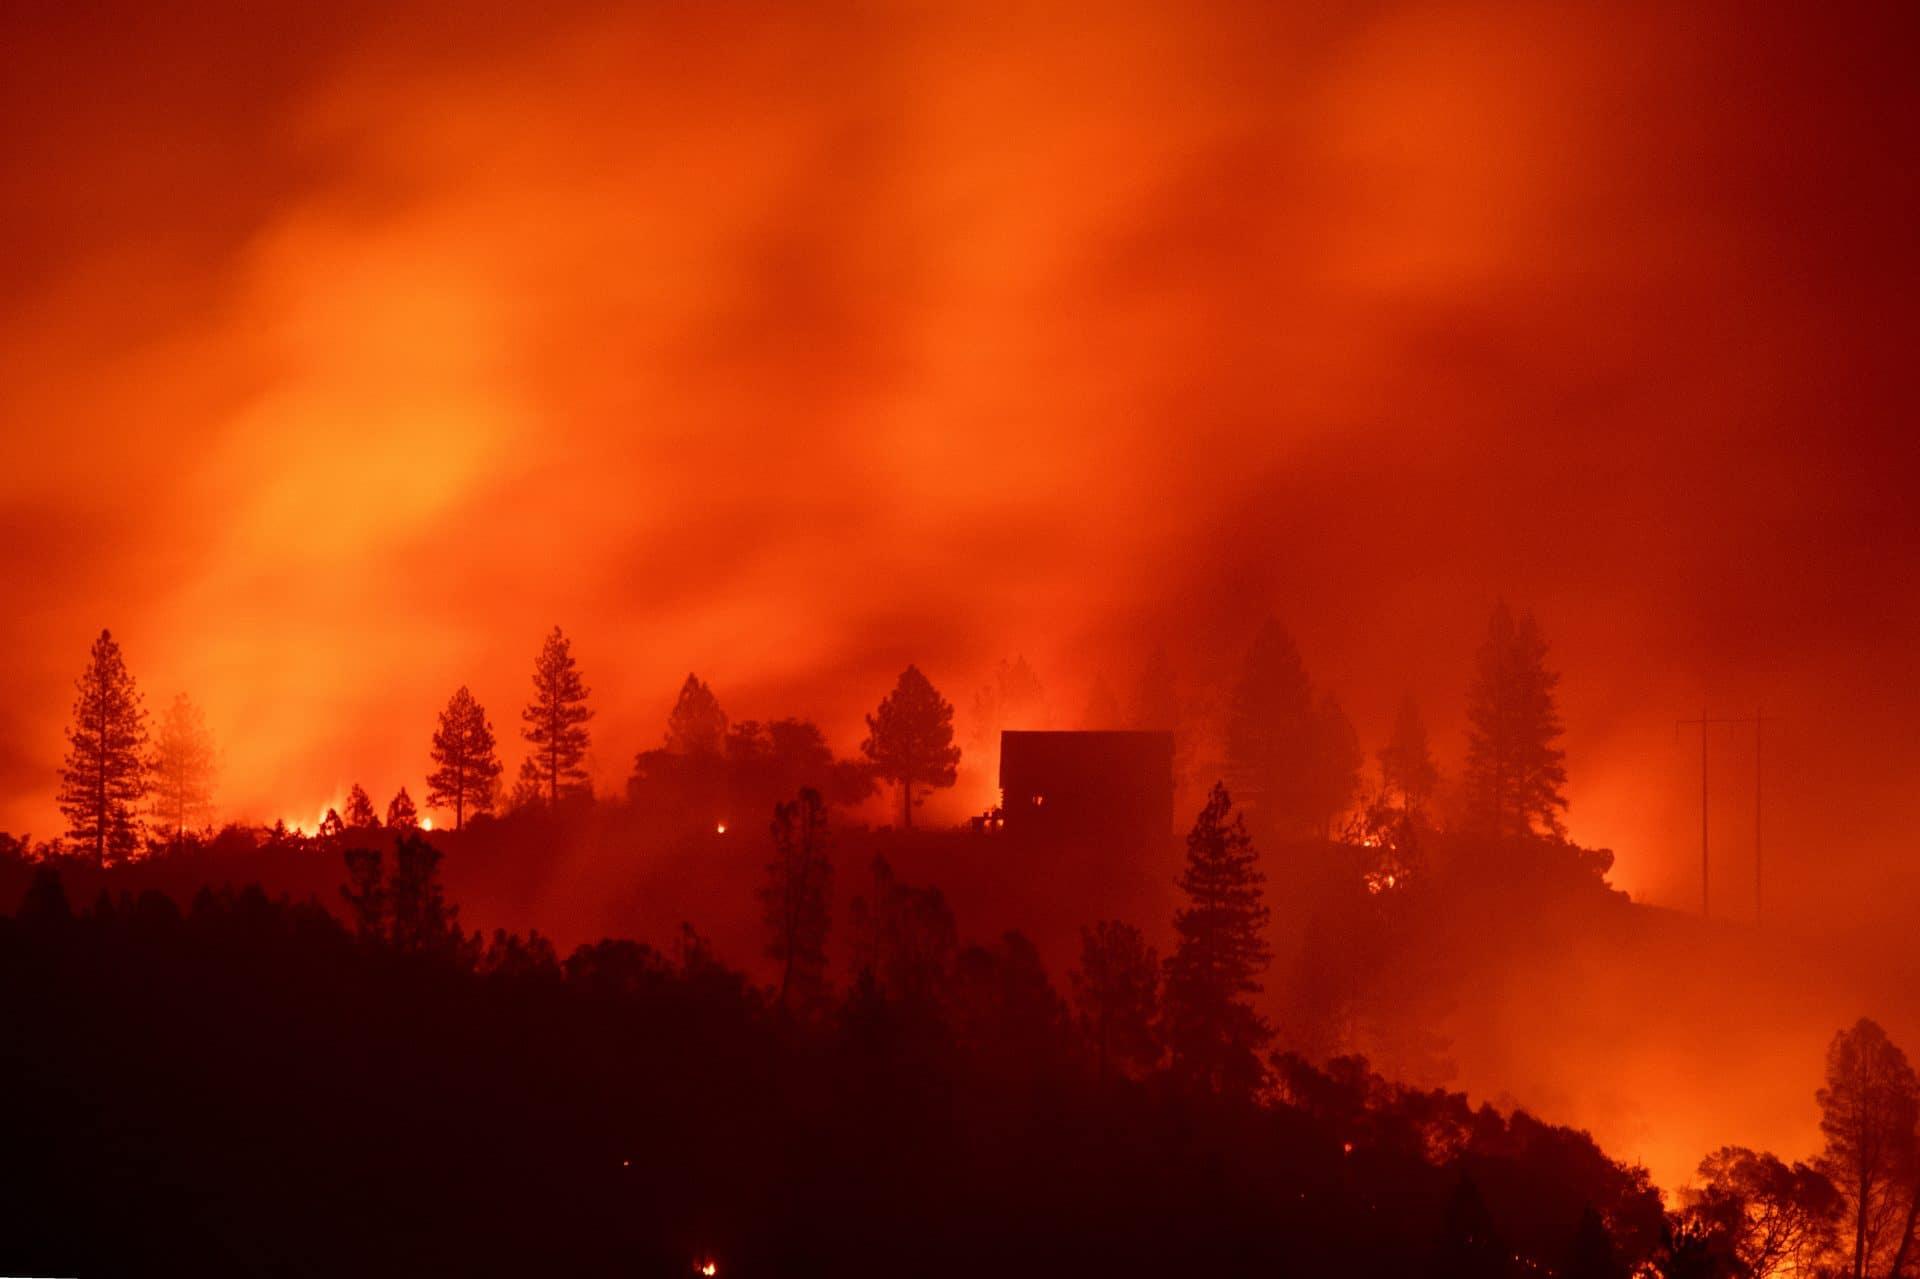 incendio california foto